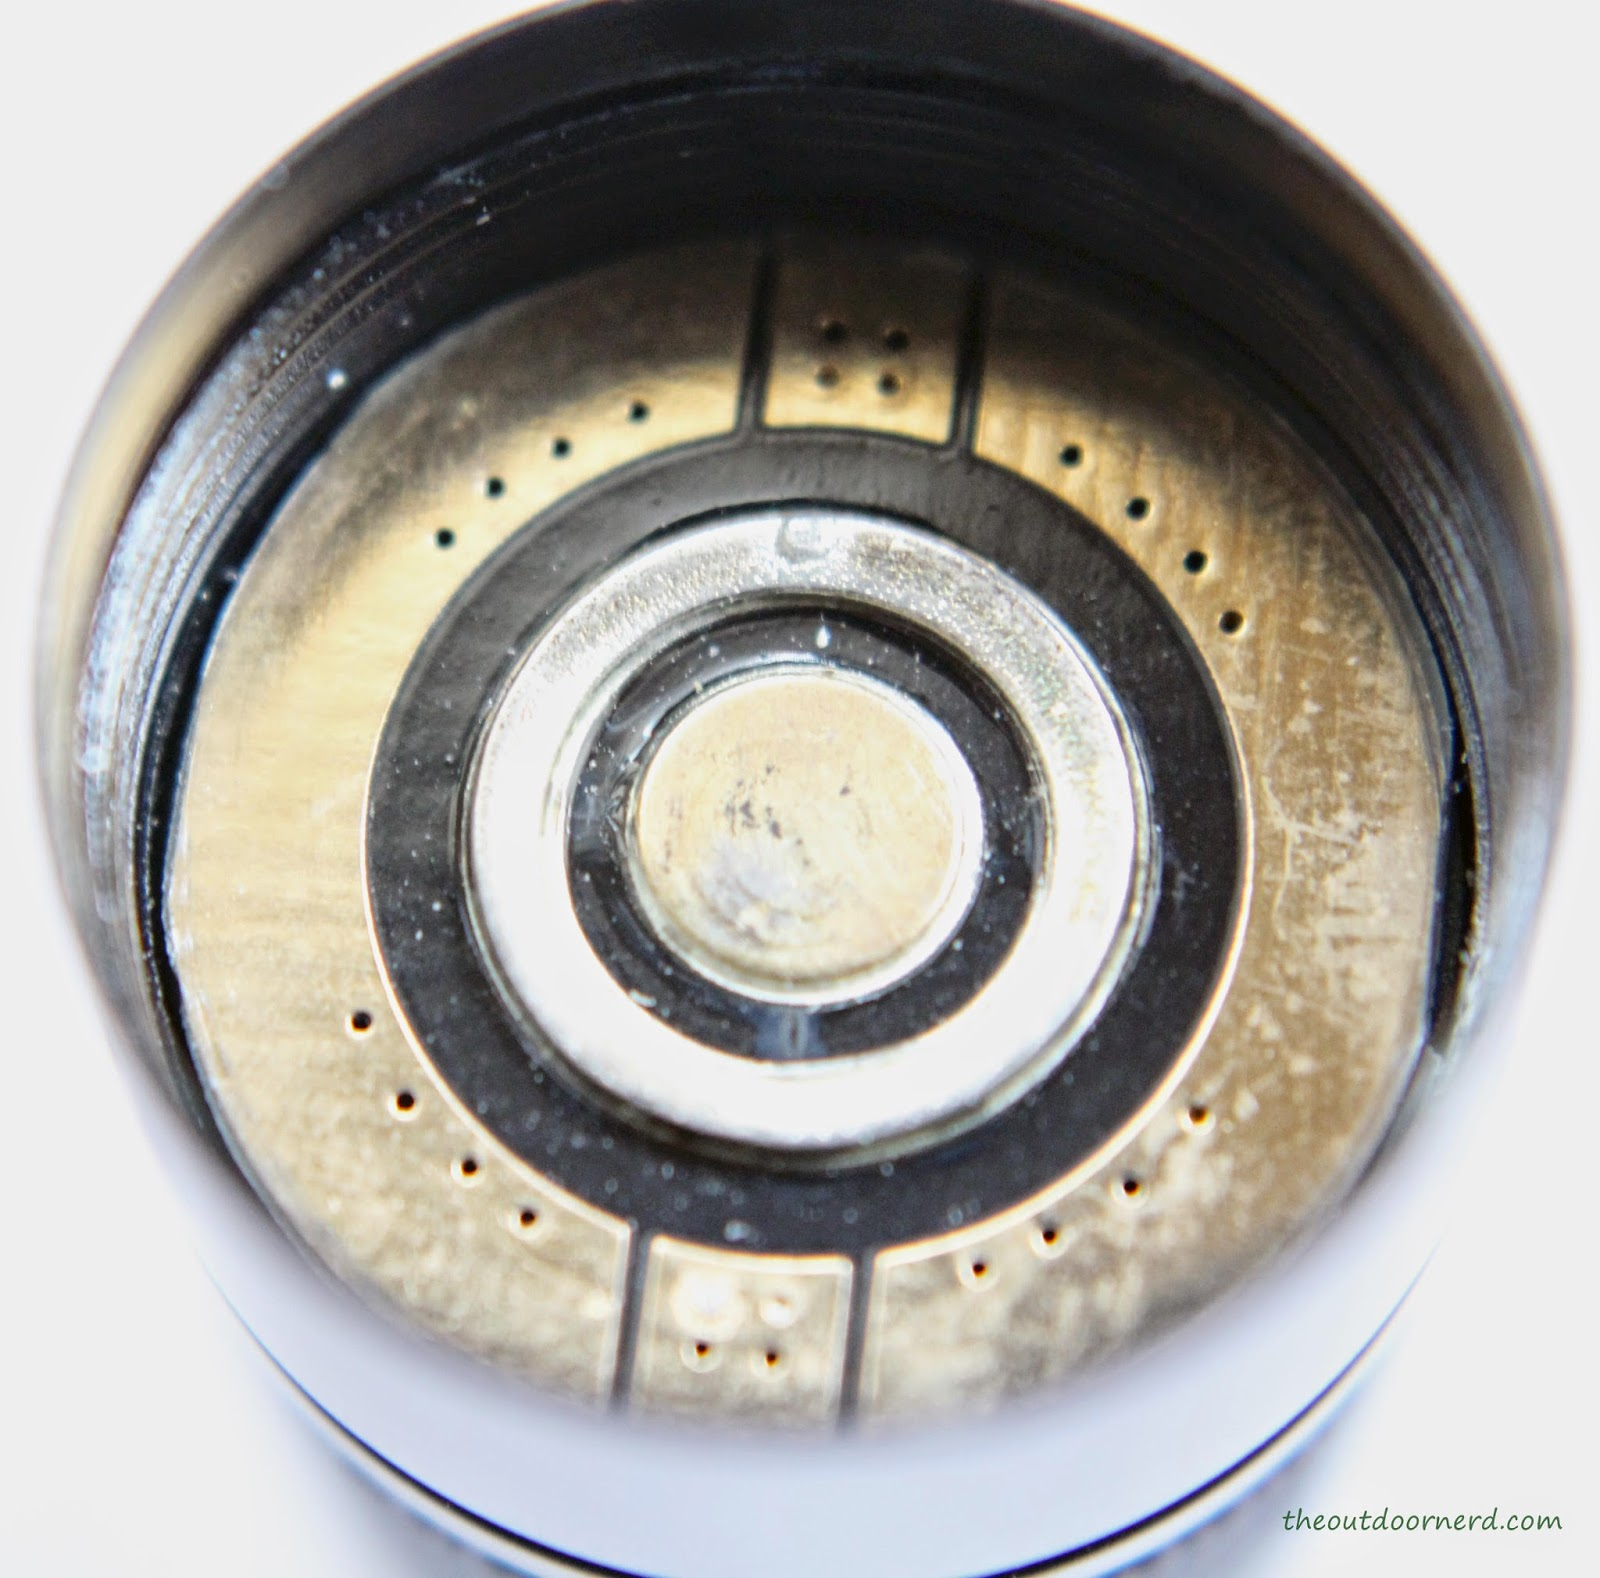 EagleTac D25LC2 Mini 18650 Flashlight Product Image 10